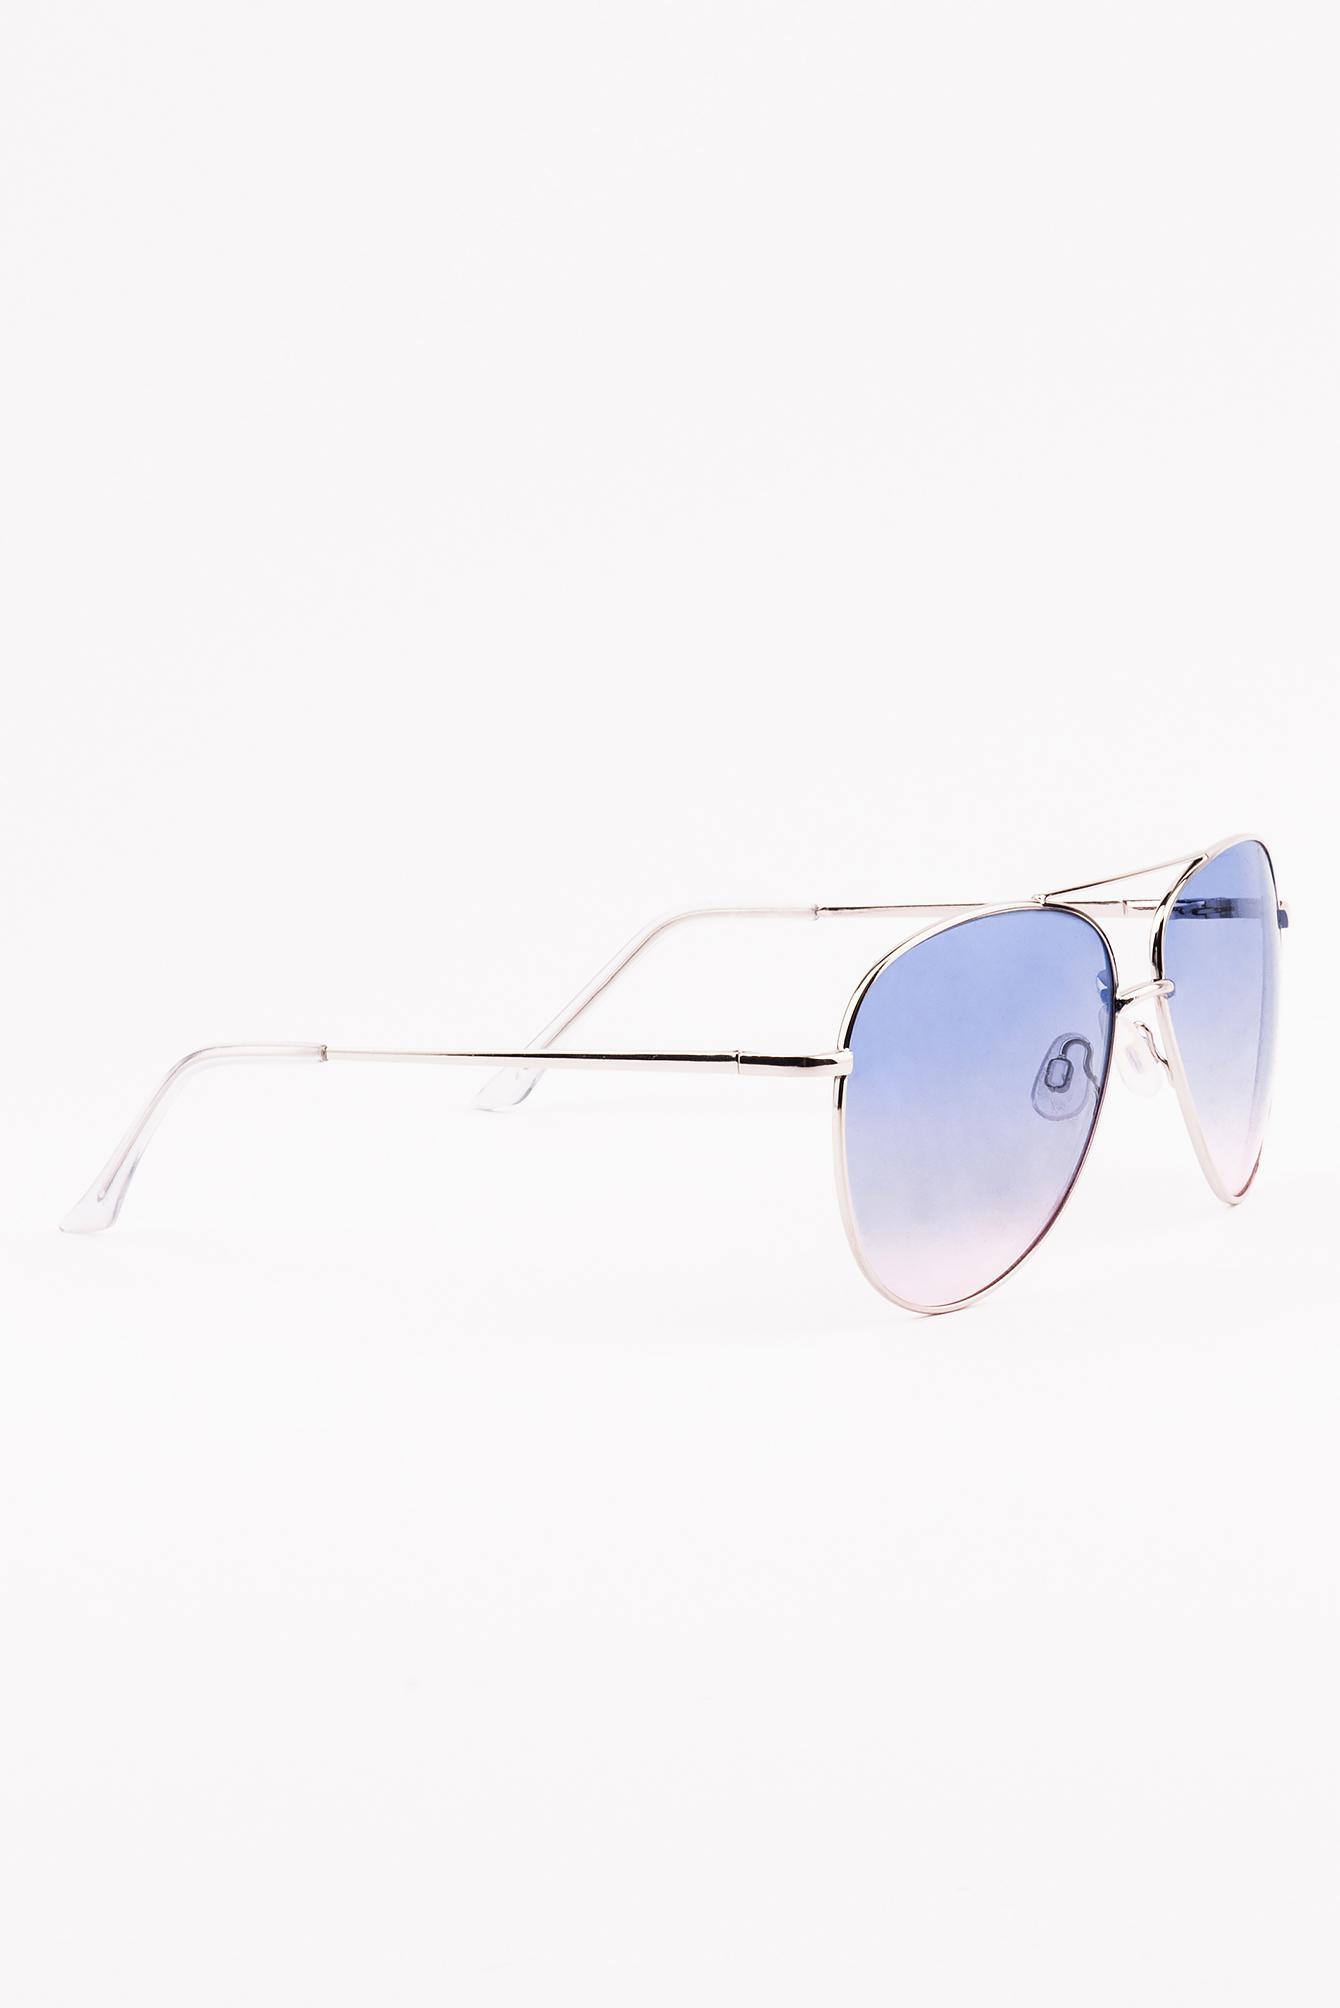 NA-KD Accessories Round Colored Sunglasses - Purple YJuQnKu